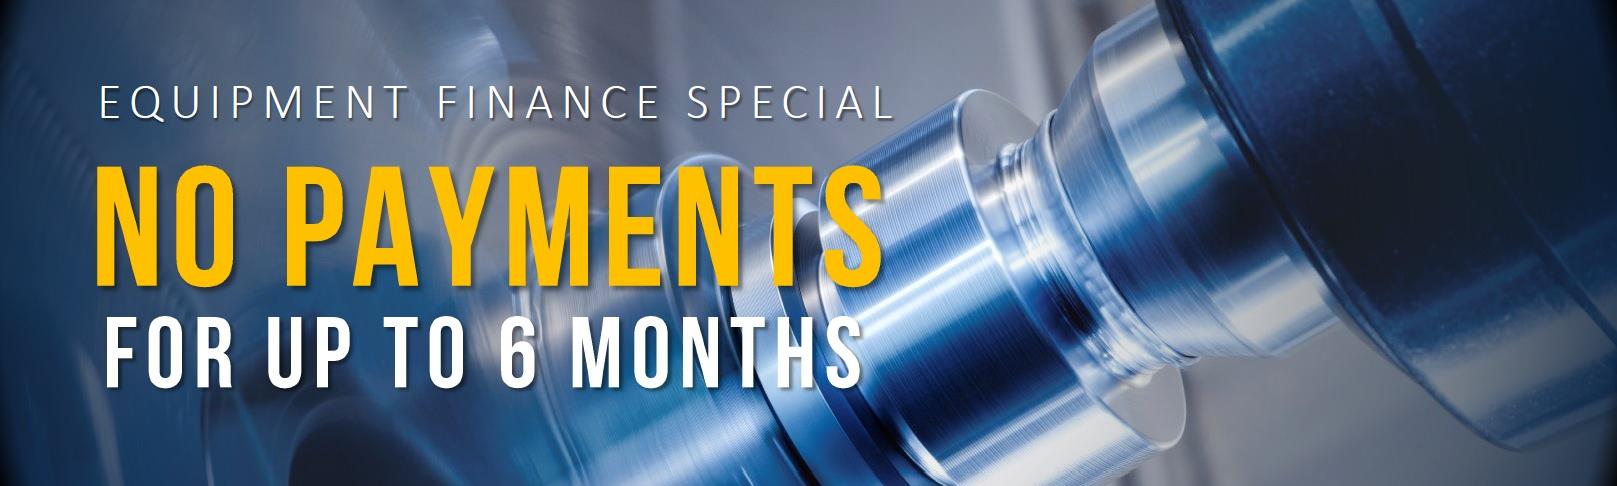 Spray Foam Equipment Finance